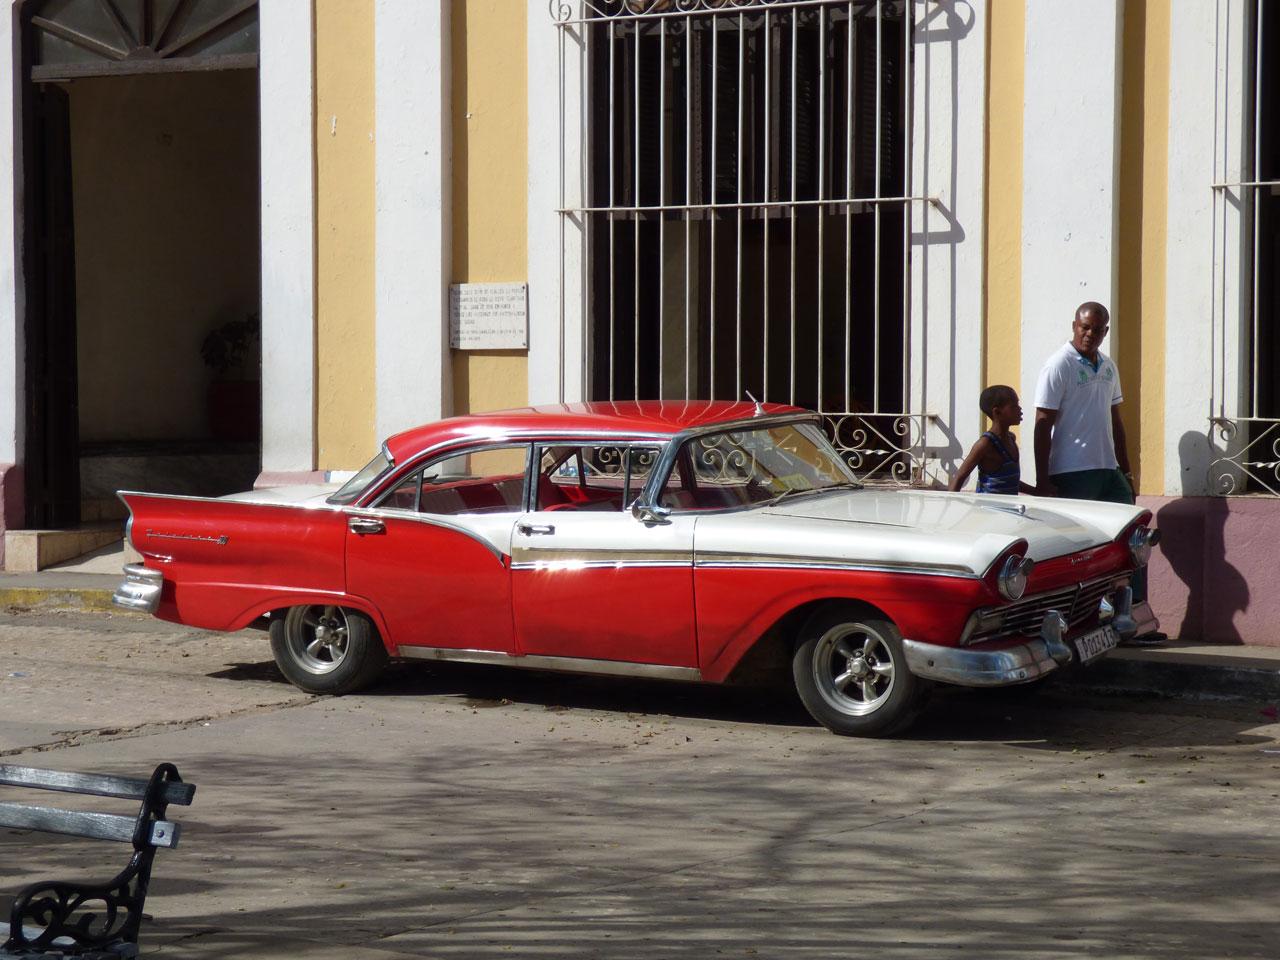 Classic American car in Trinidad, Cuba